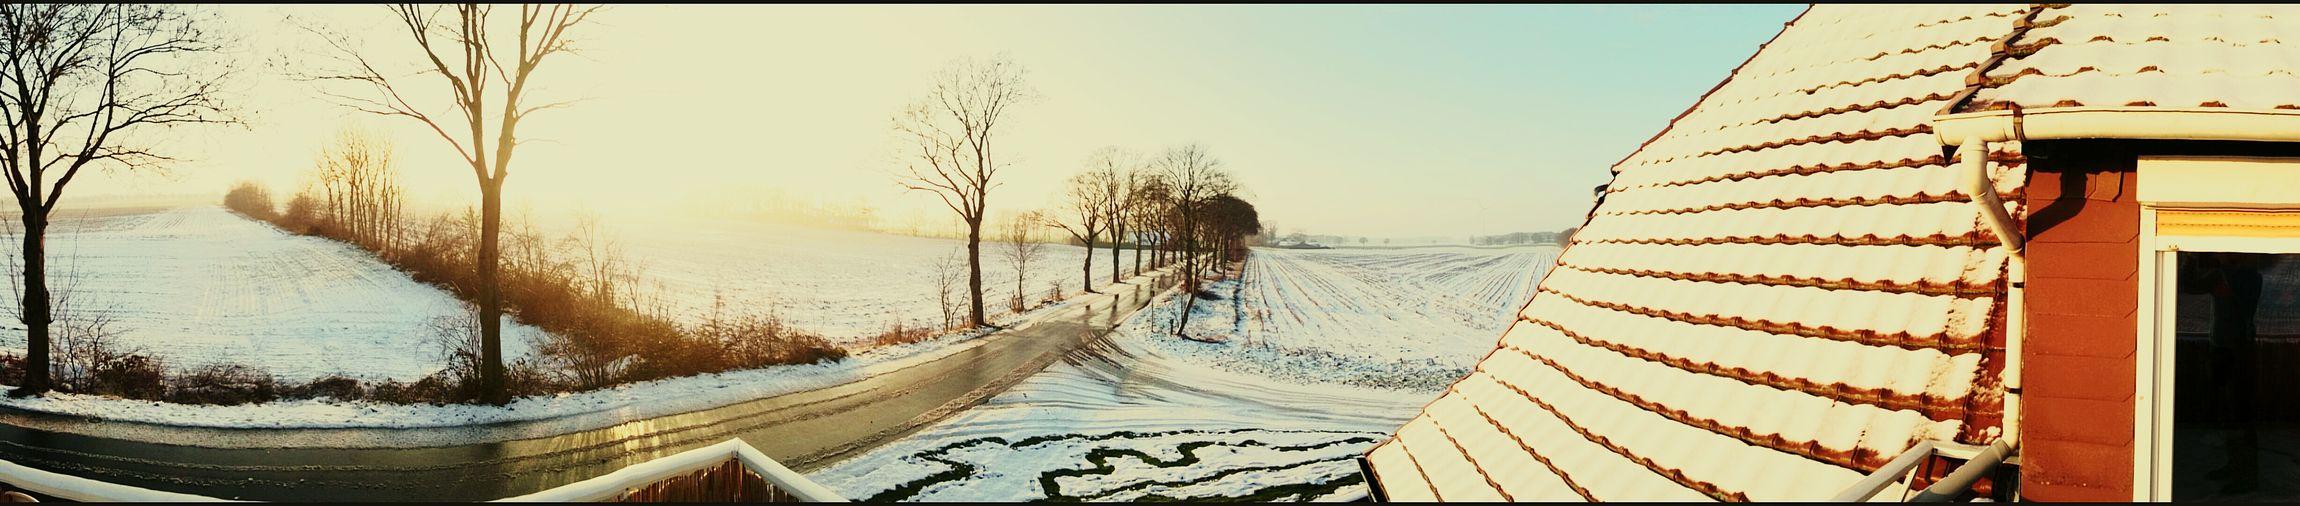 Sunny Days in Drebberly Hills - Snowfun... jeehaaaw